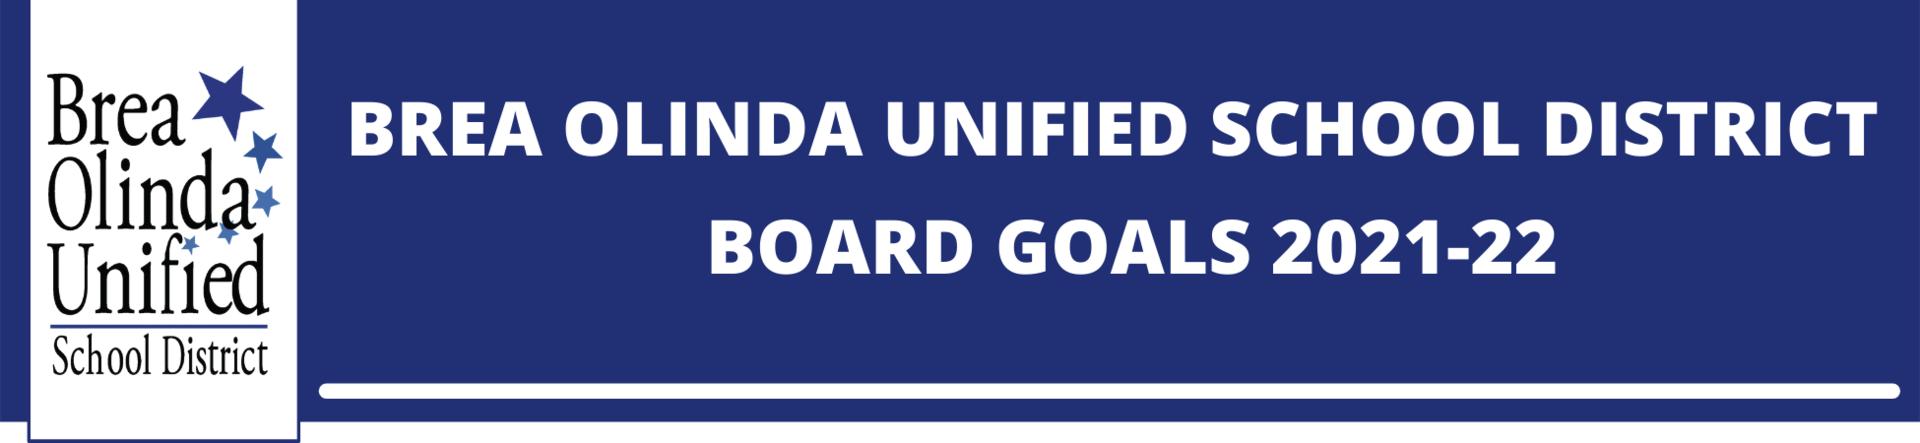 BOUSD Board Goals 2021-22